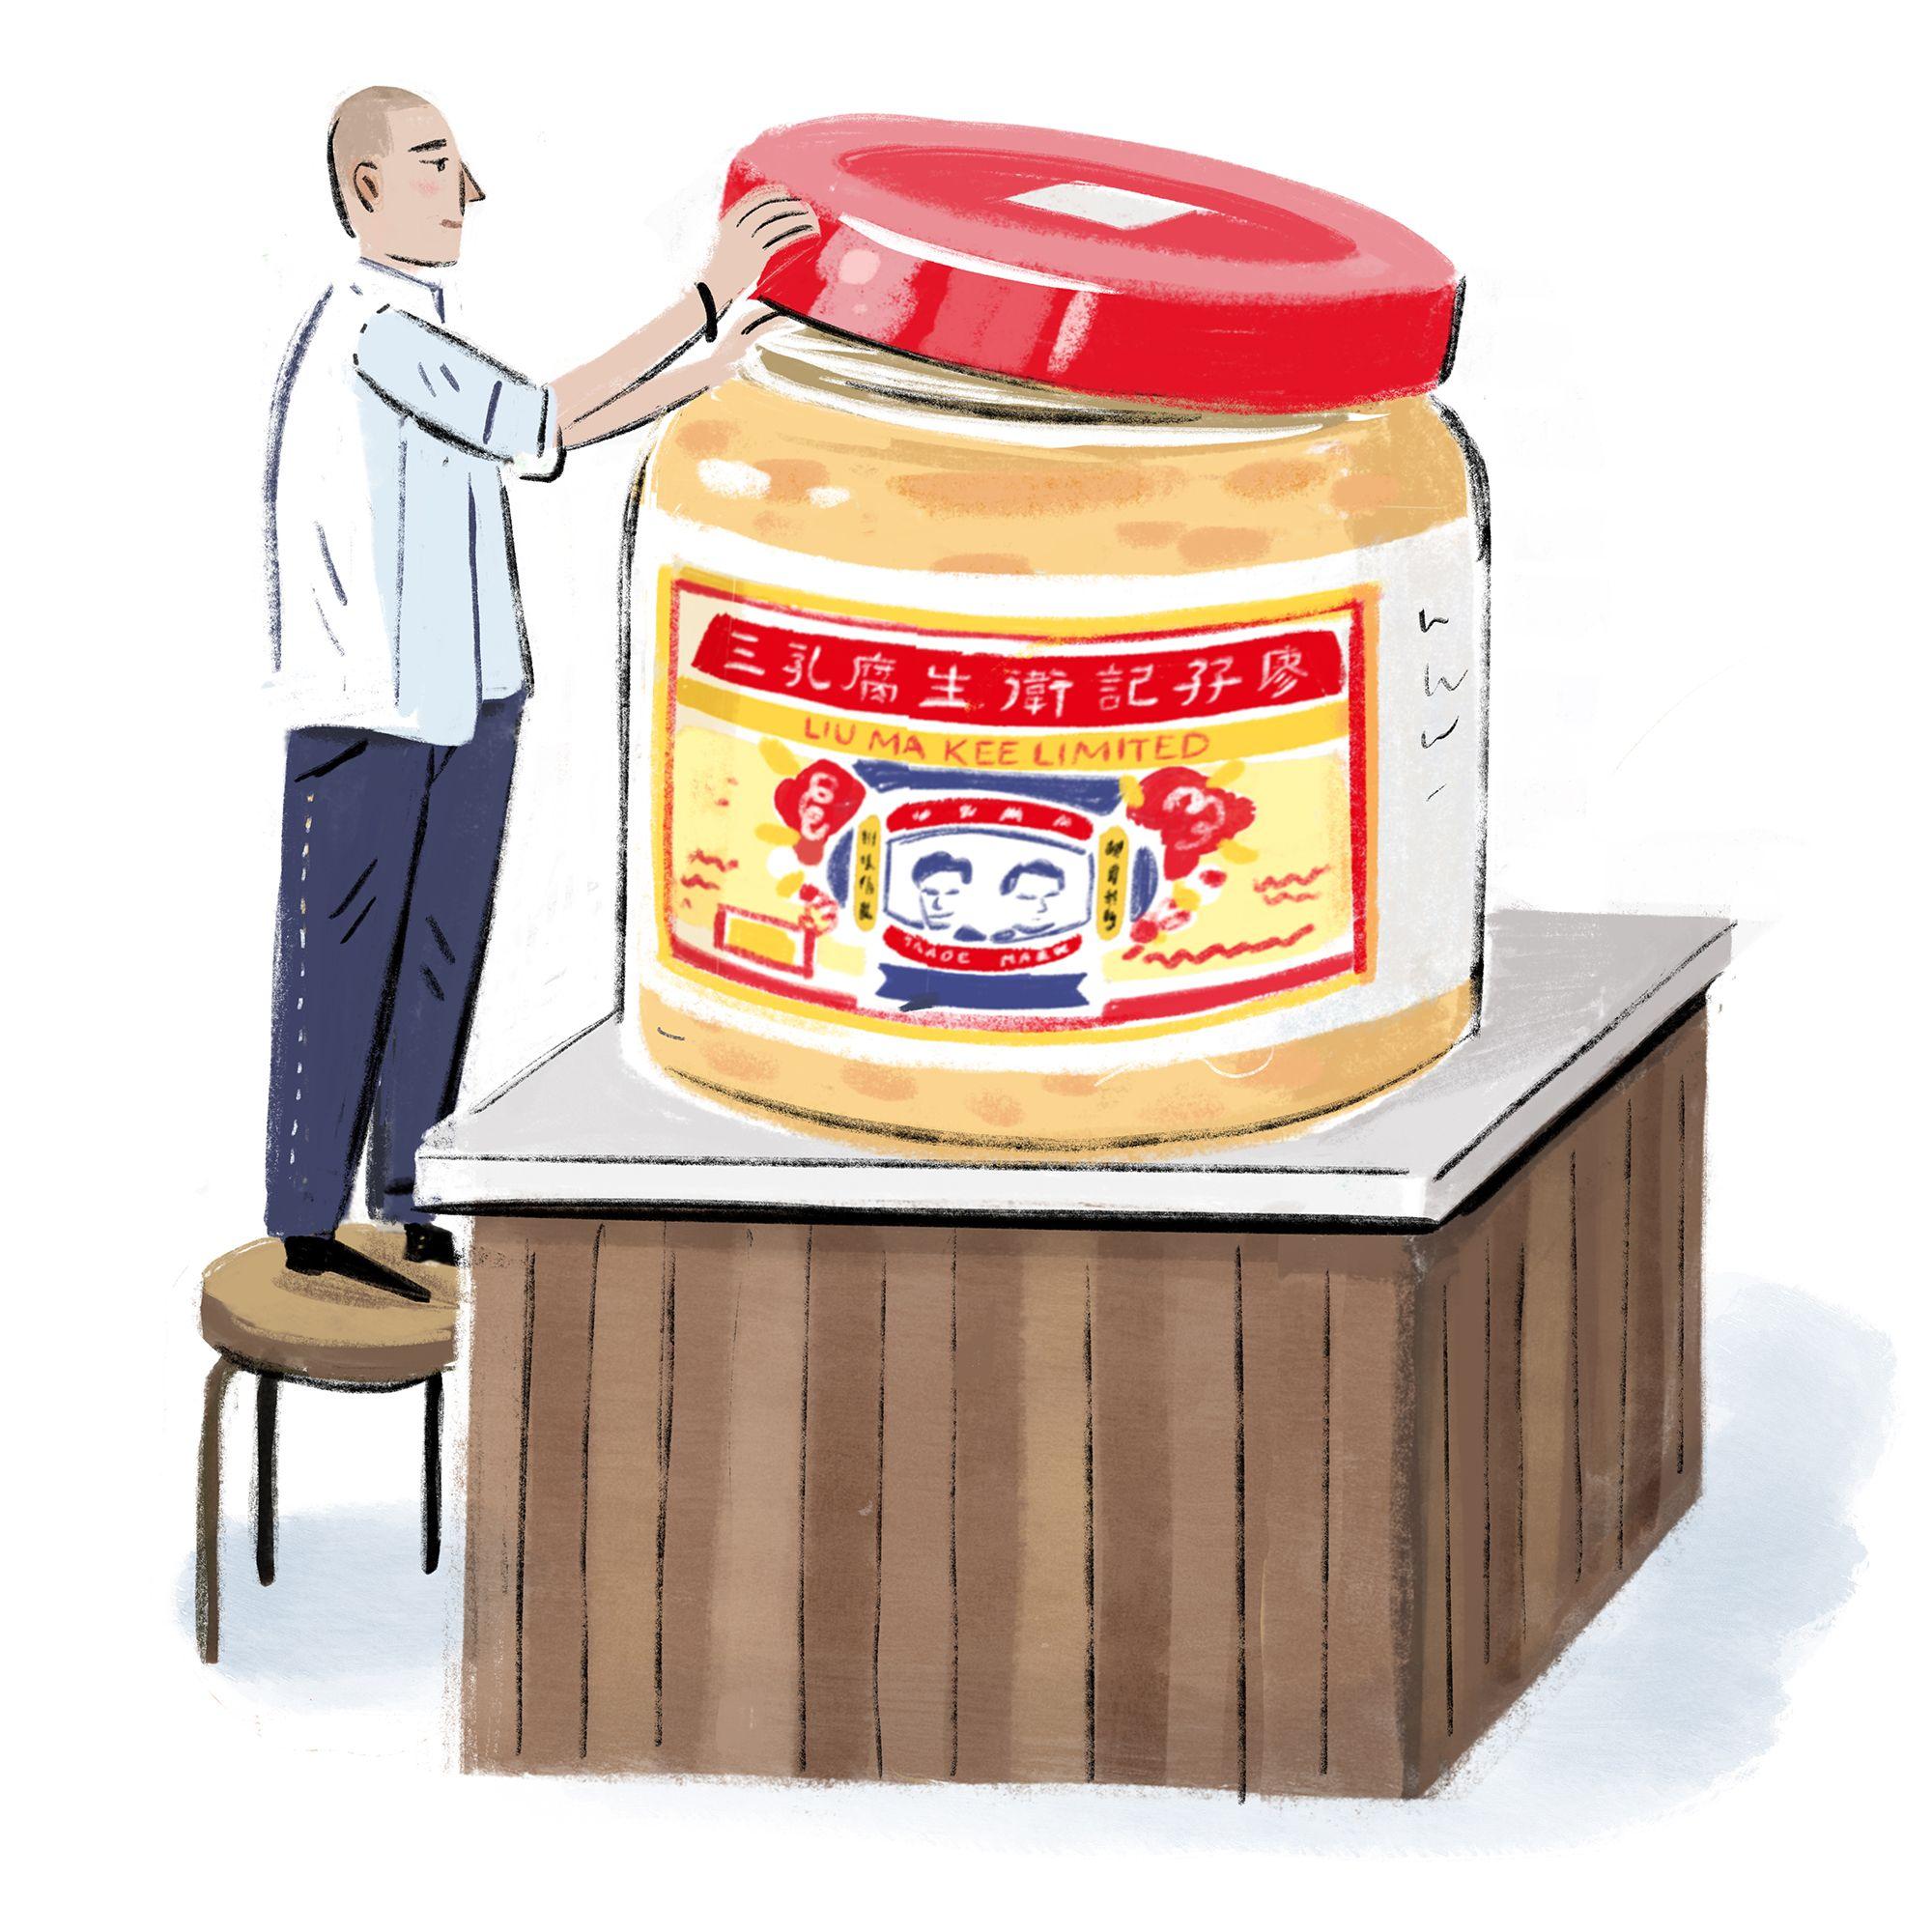 Samsen's Adam Cliff On His Favourite Hong Kong Food Moments